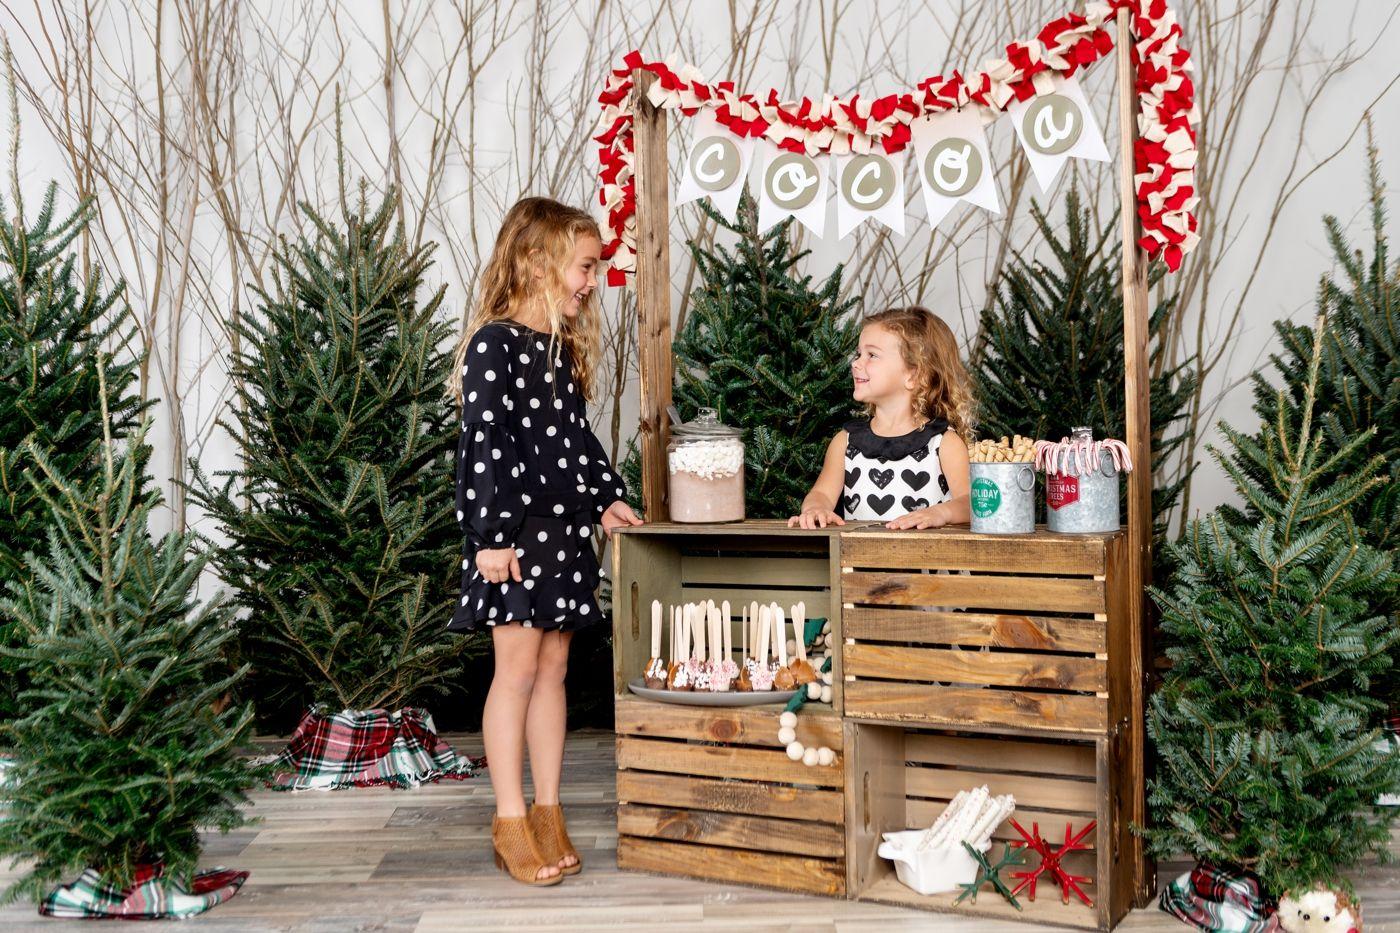 Orlando Christmas Minis With A Girl And Her Glitter Orlando Wedding Photographer Kristen Weaver Photography In 2020 Hot Cocoa Stand Diy Hot Cocoa Orlando Christmas